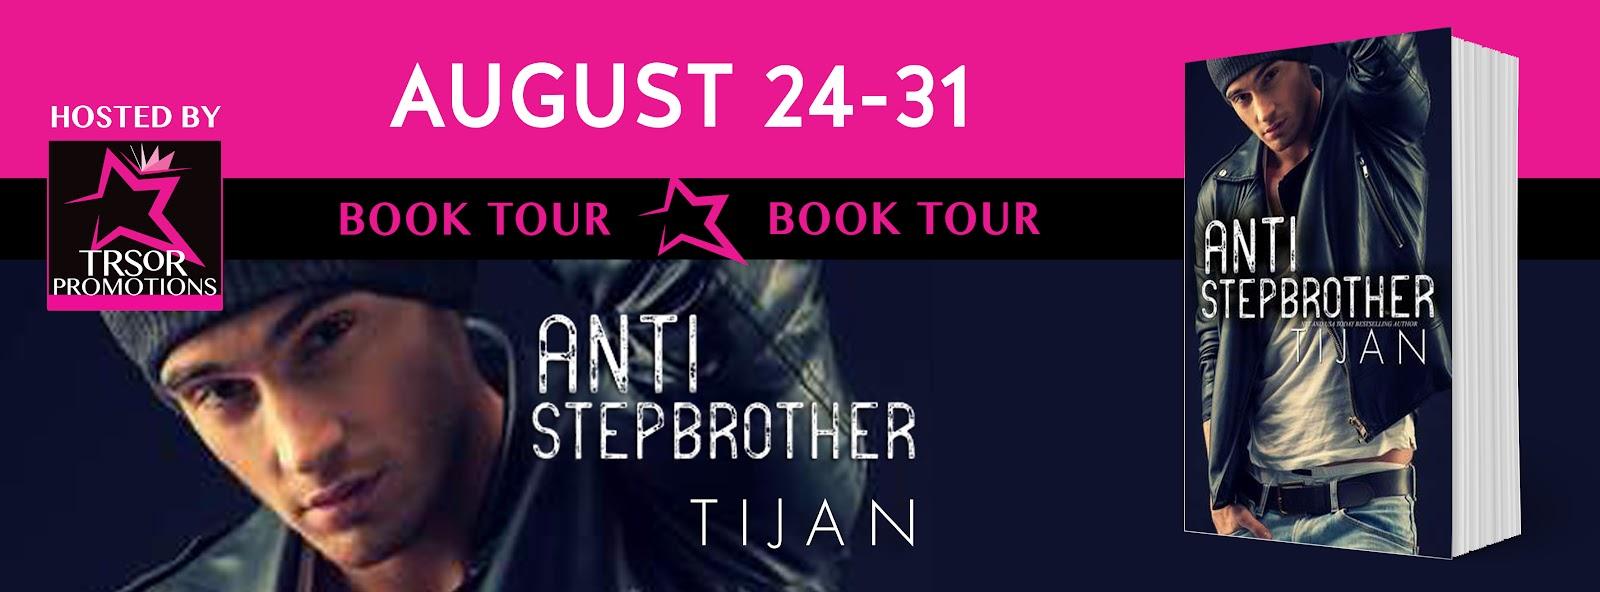 ANTI_STEP_BROTHER_BOOK_TOUR.jpg